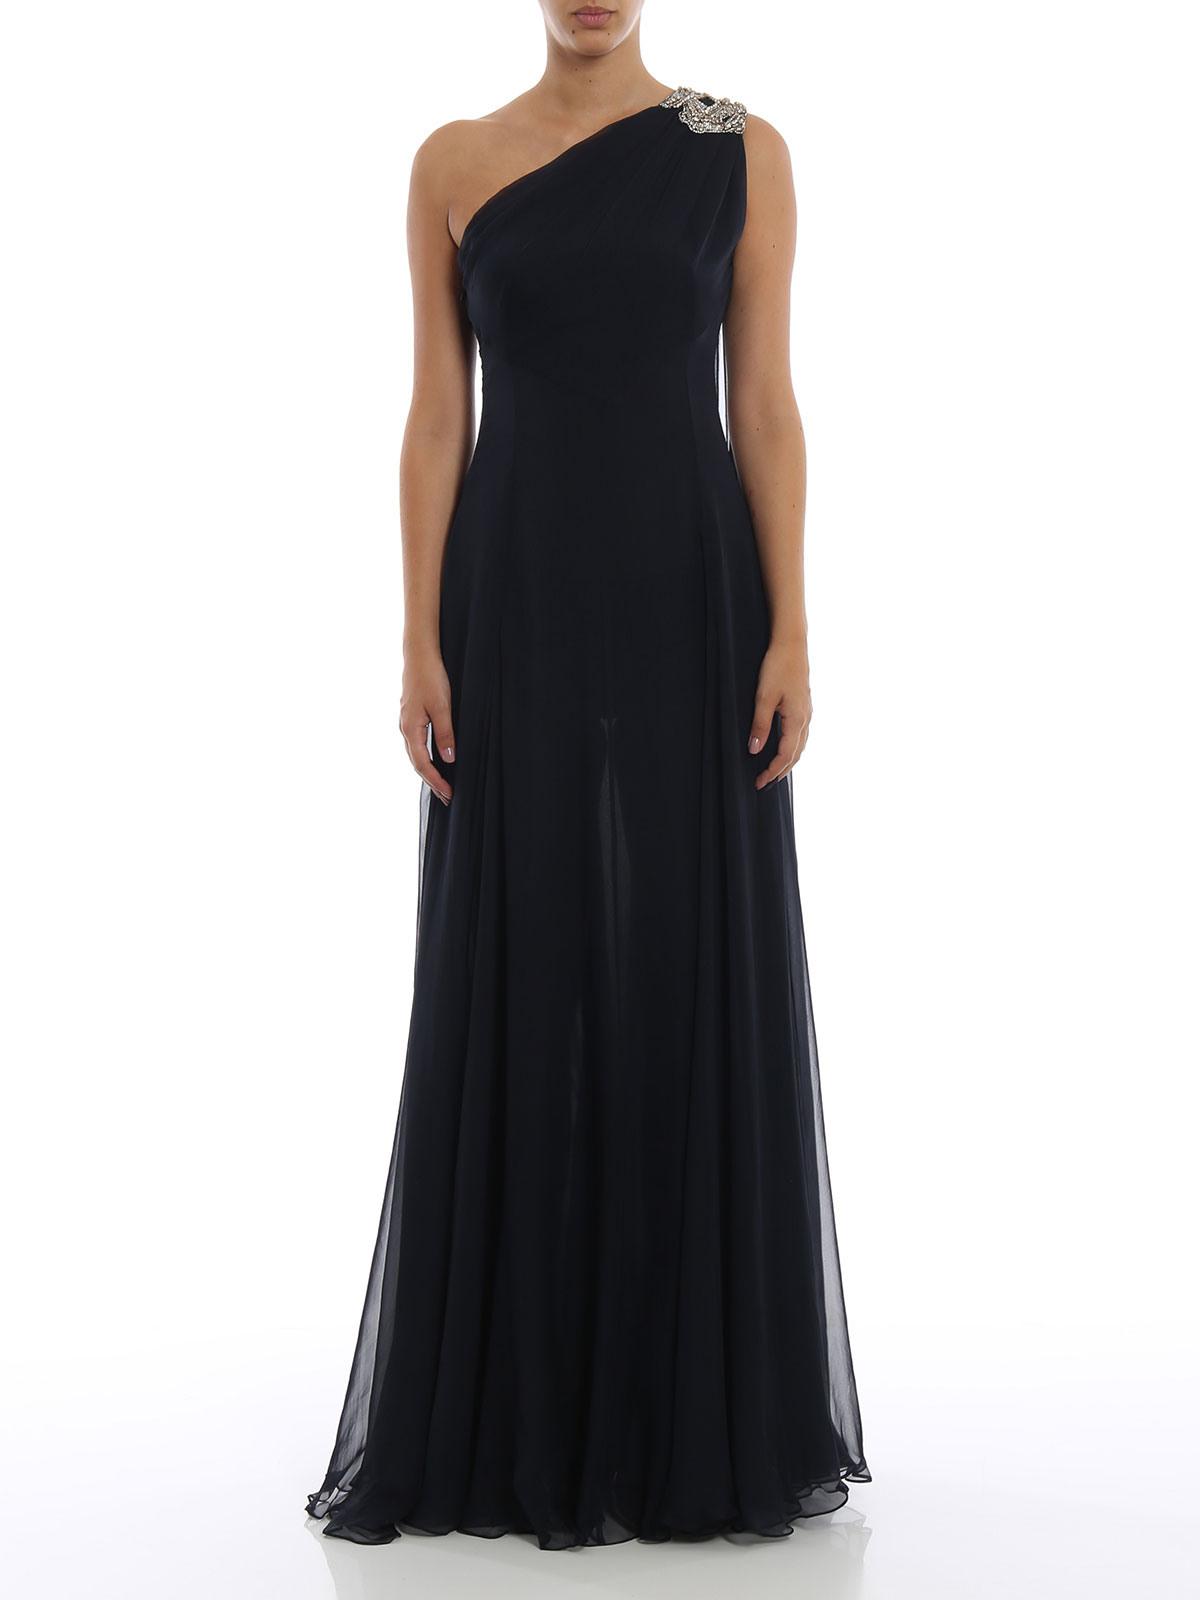 10 Perfekt Alexander Mc Queen Abendkleid Design Kreativ Alexander Mc Queen Abendkleid Ärmel